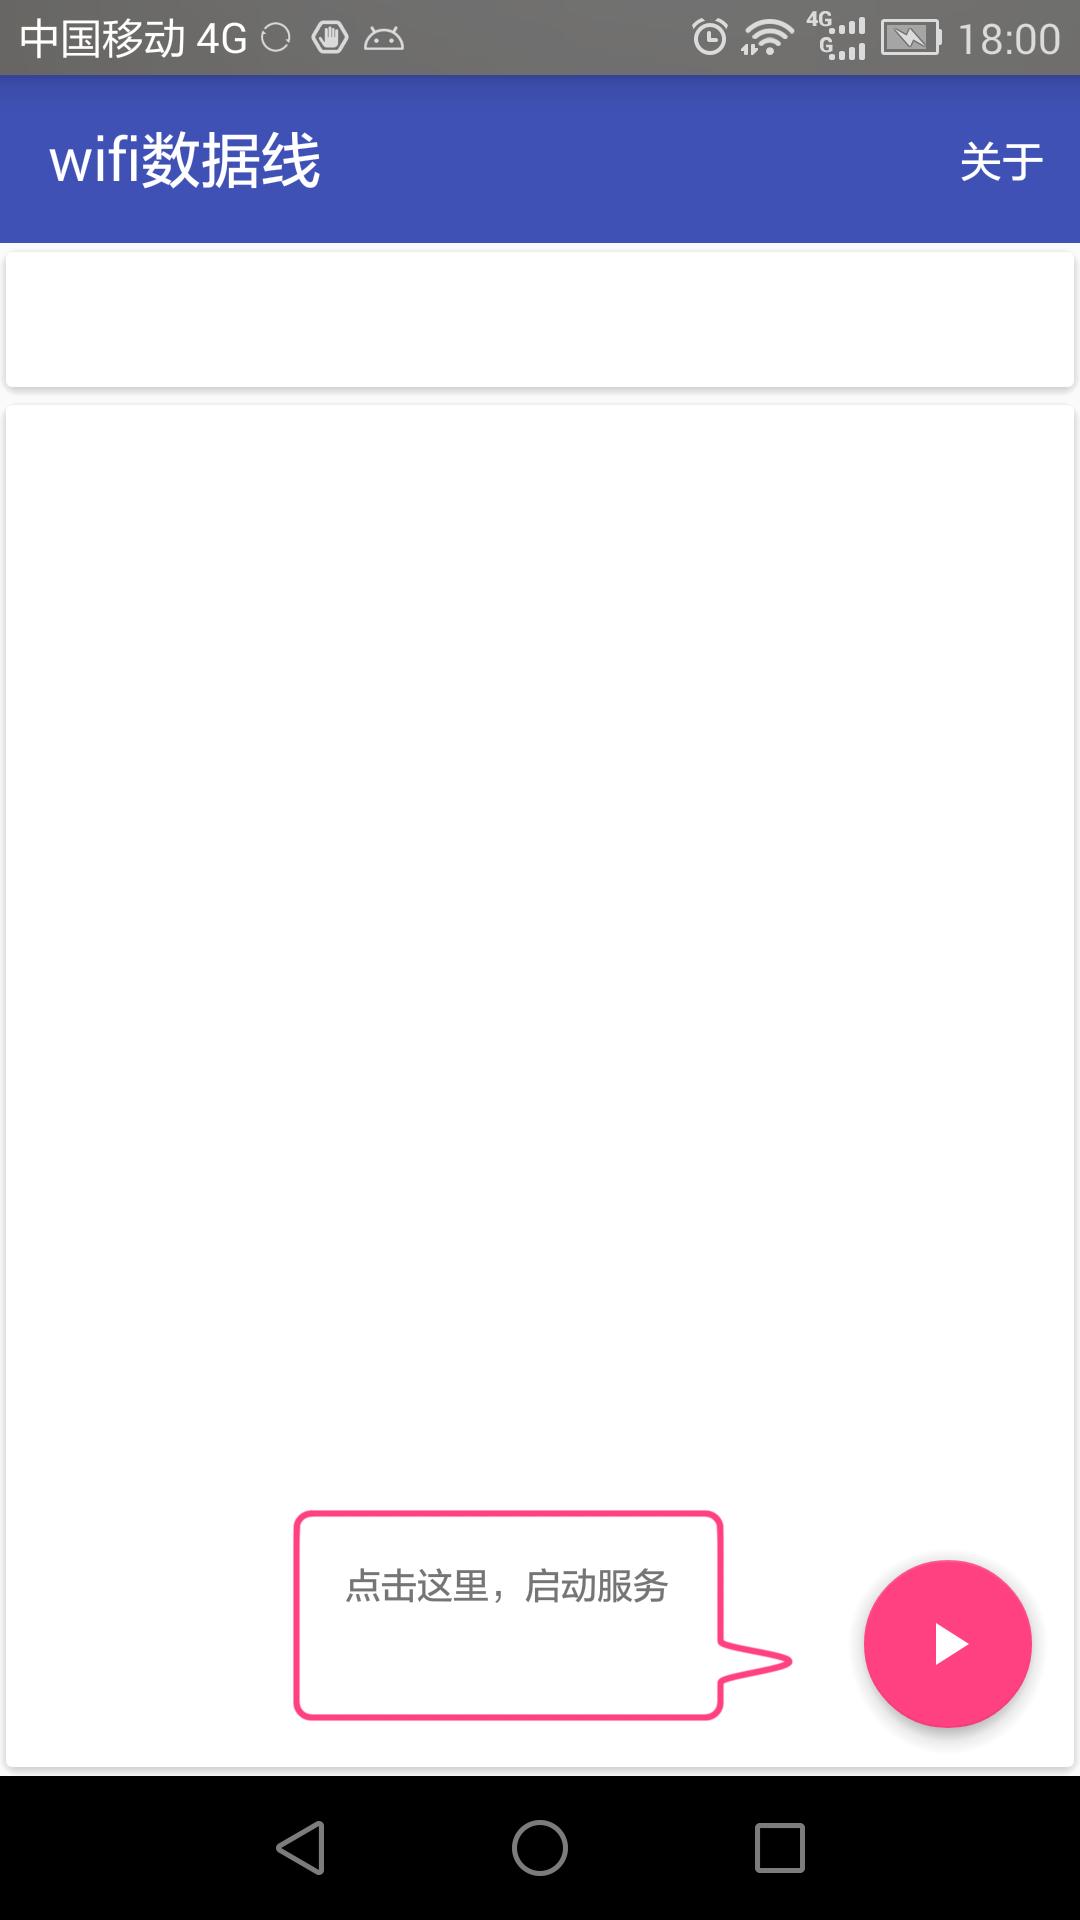 wifi数据线-应用截图